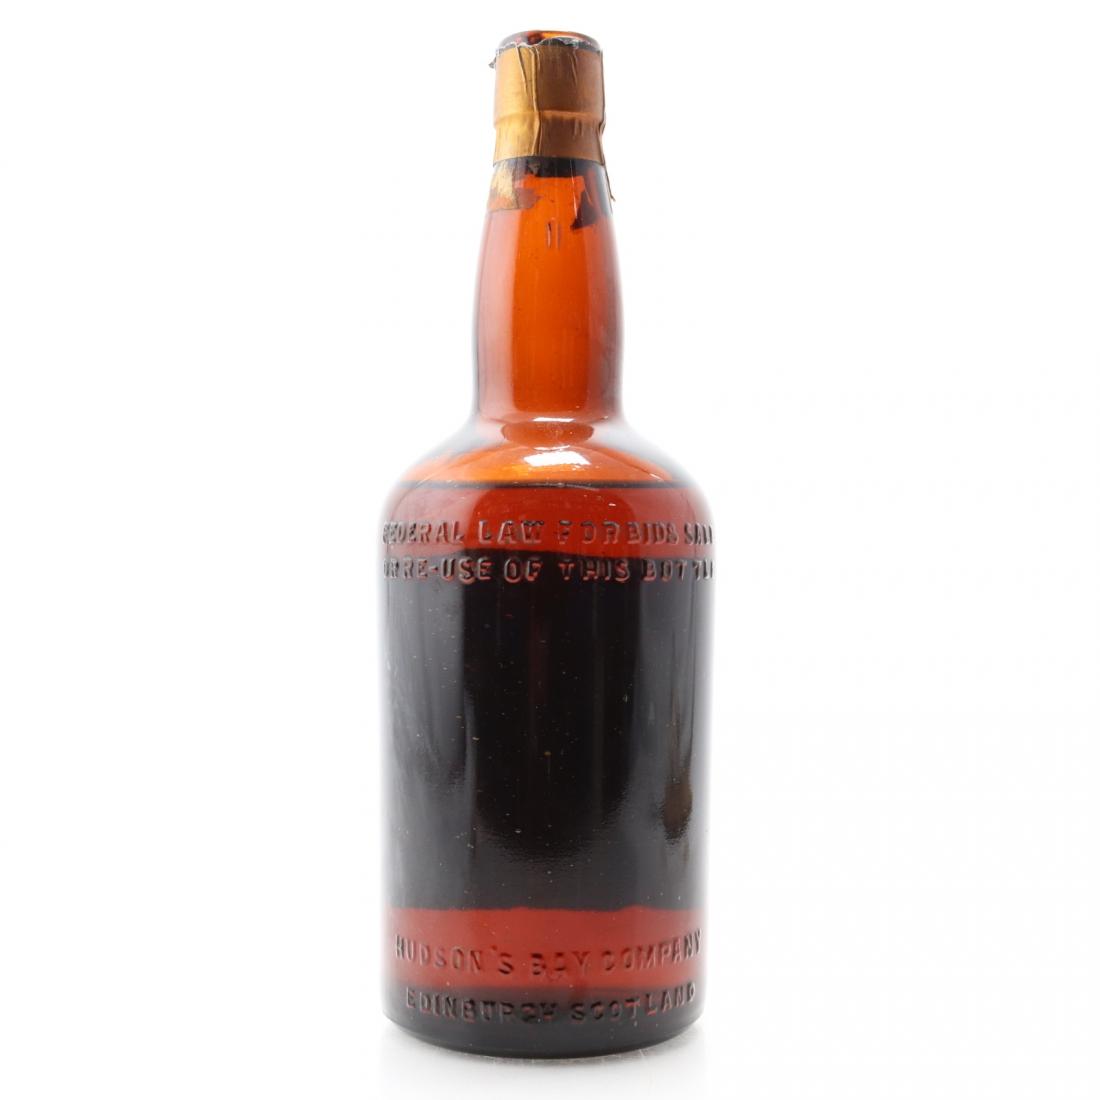 Hudson's Bay '1670' Brand 15 Year Old Scotch circa 1960s